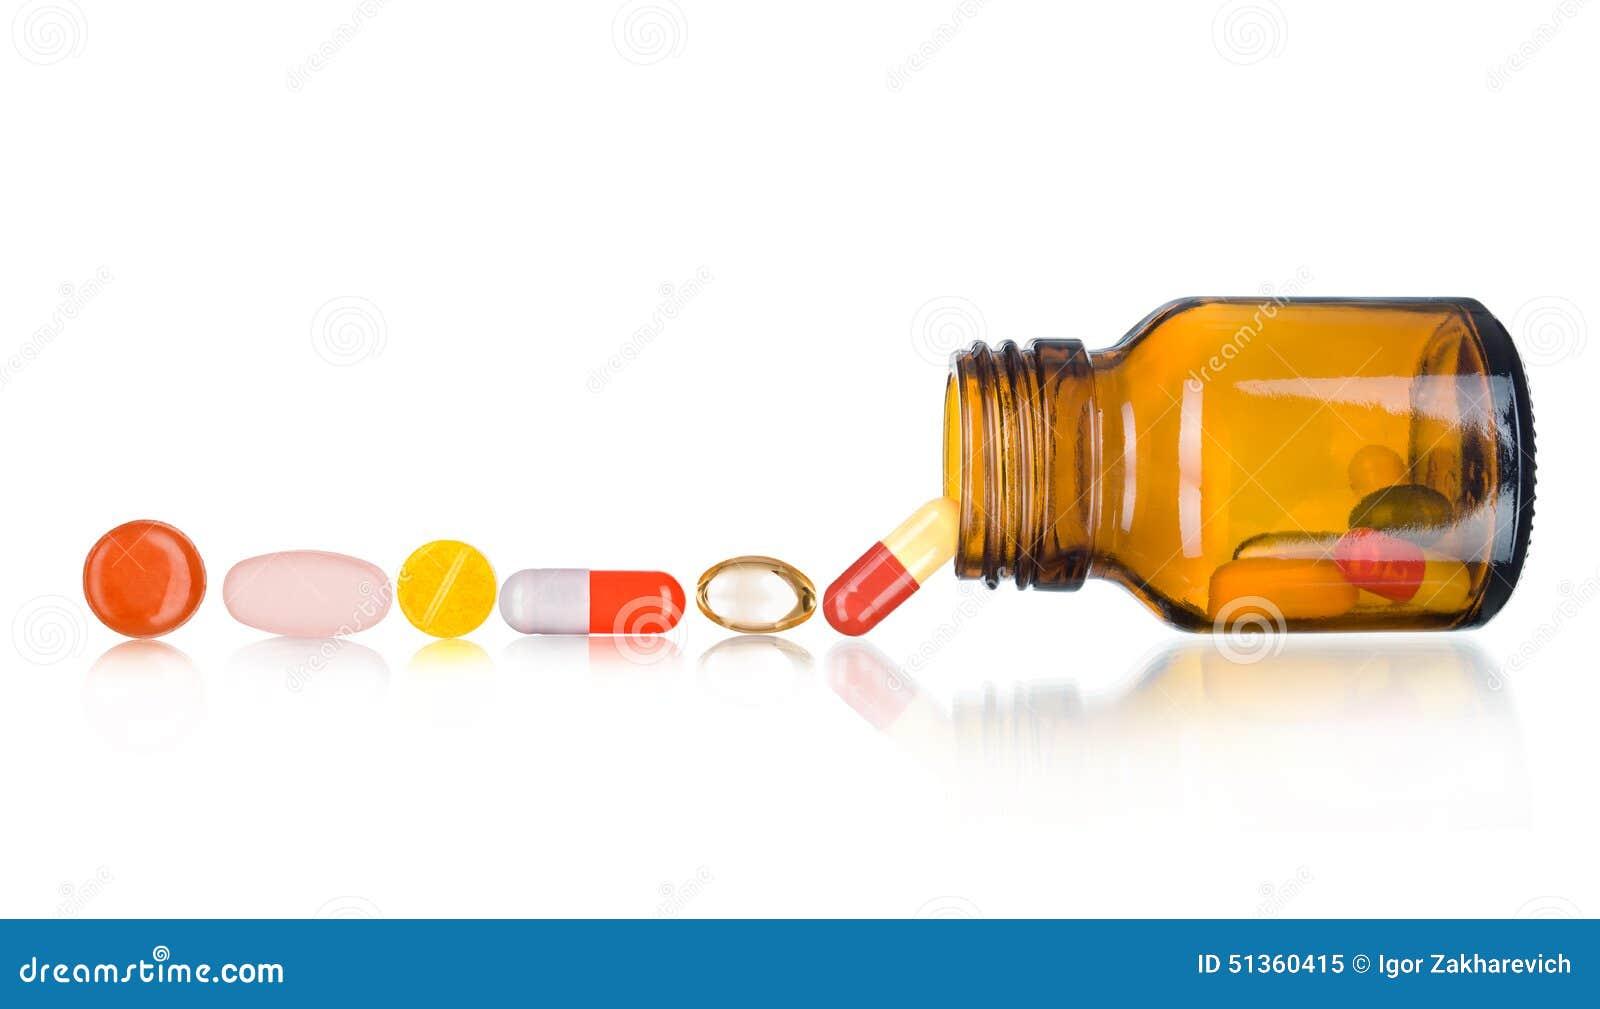 Generic Viagra Red Pill